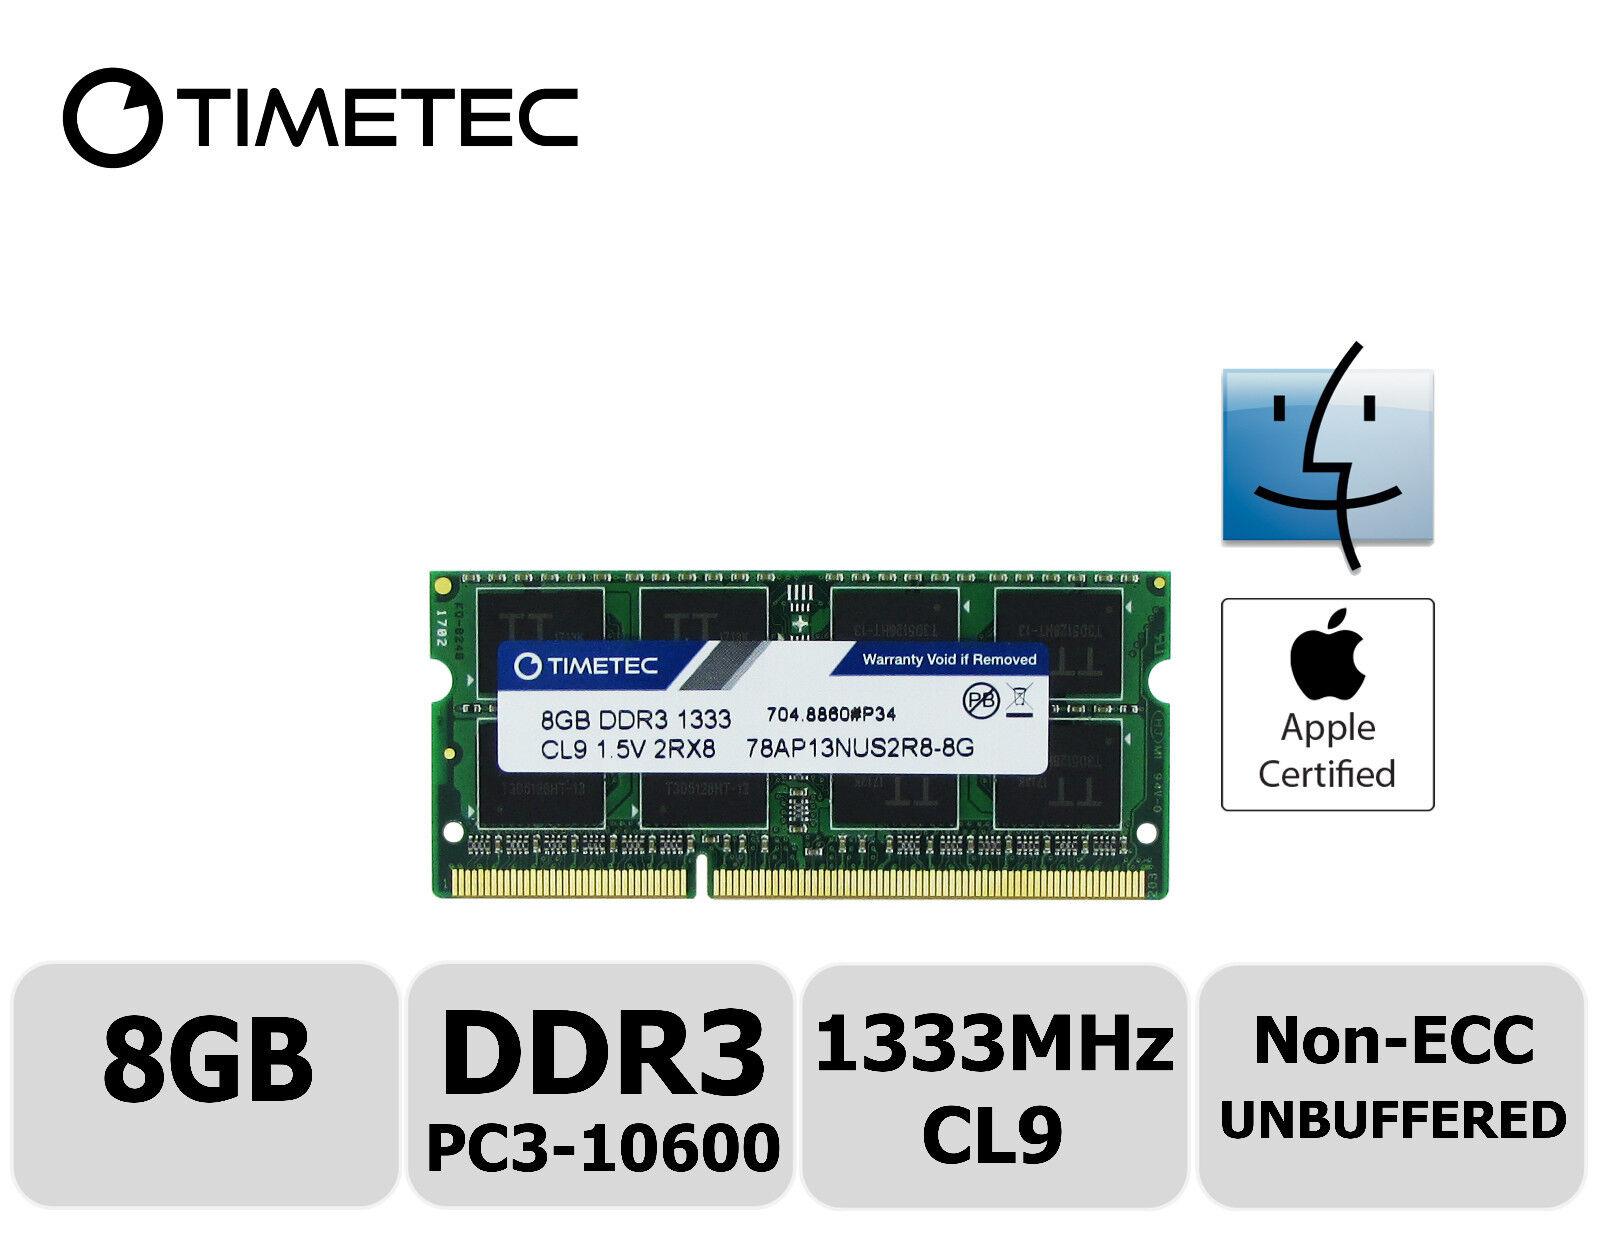 Timetec 2x4GB DDR3 1333MHz PC3-10600 Non-ECC 1.5V 2Rx8 UDIMM Desktop Memory RAM